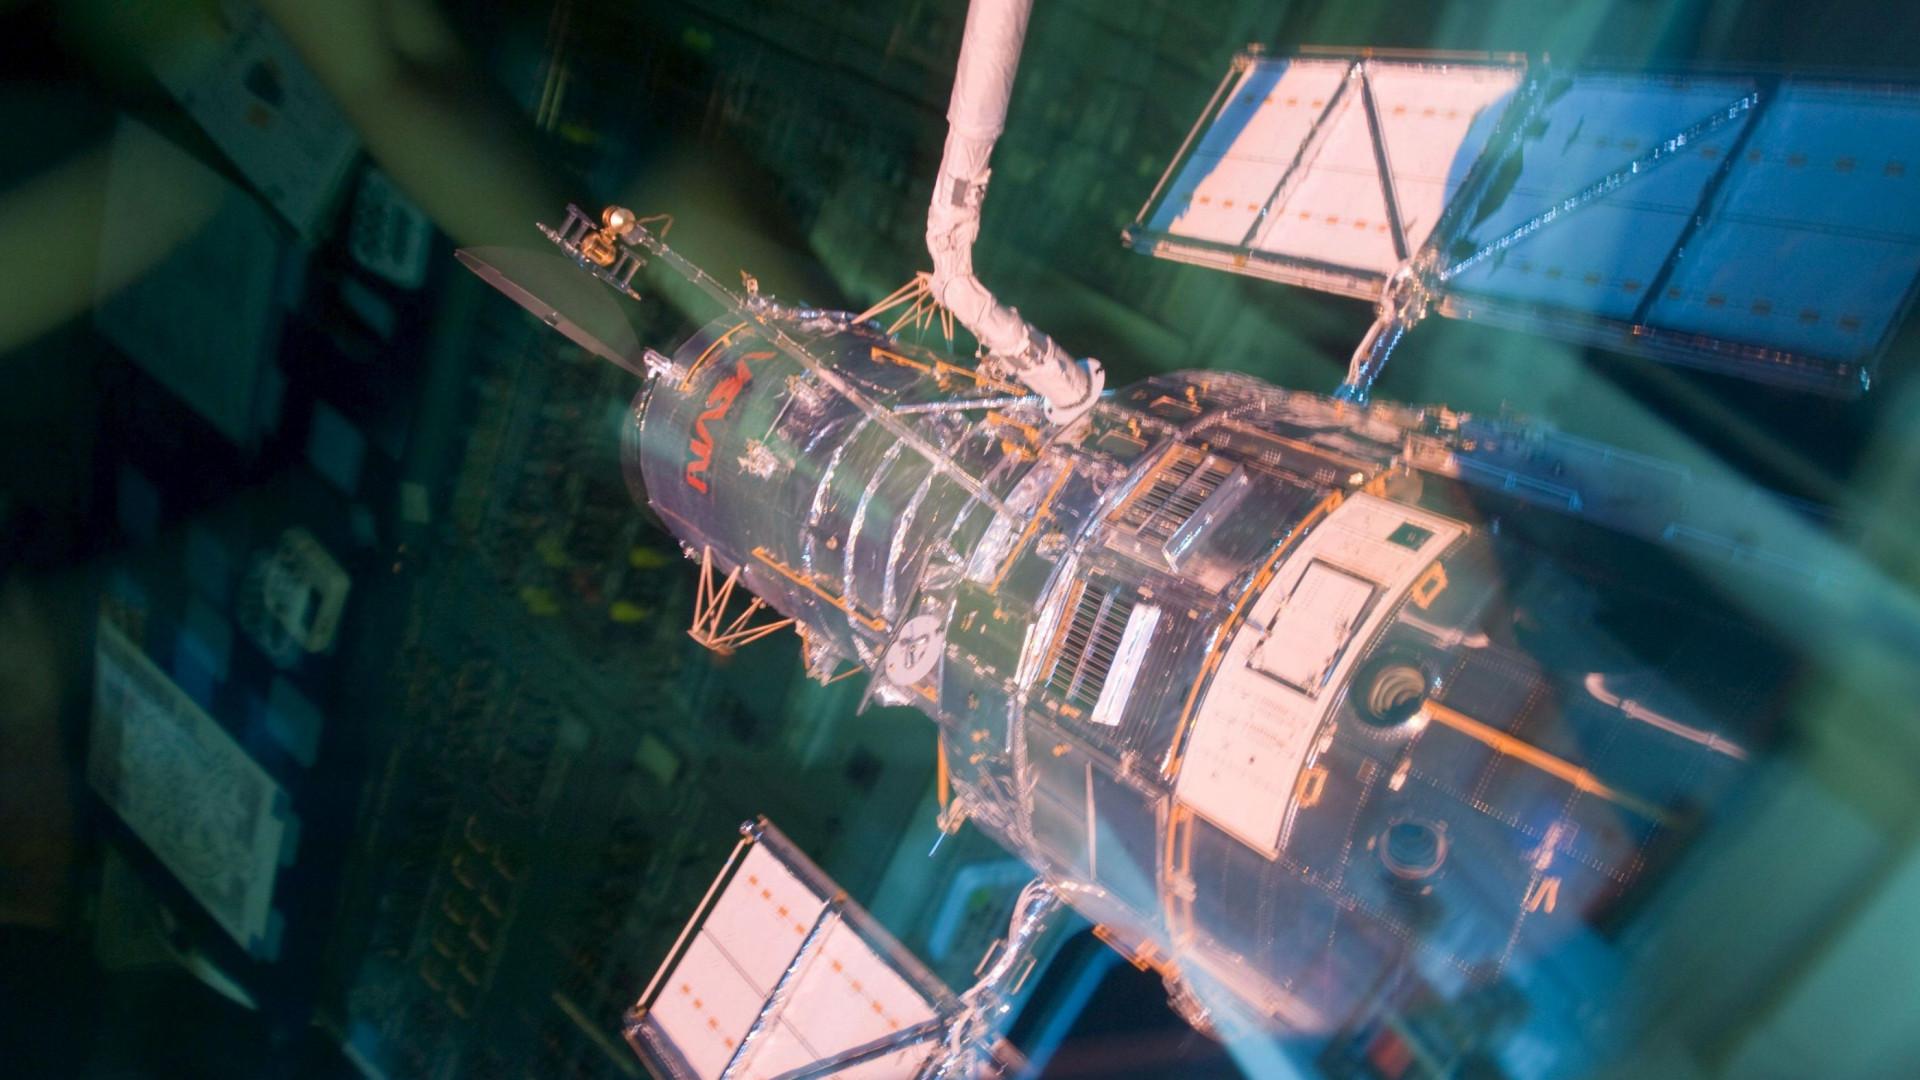 Avaria no telescópio espacial Hubble suspende observações